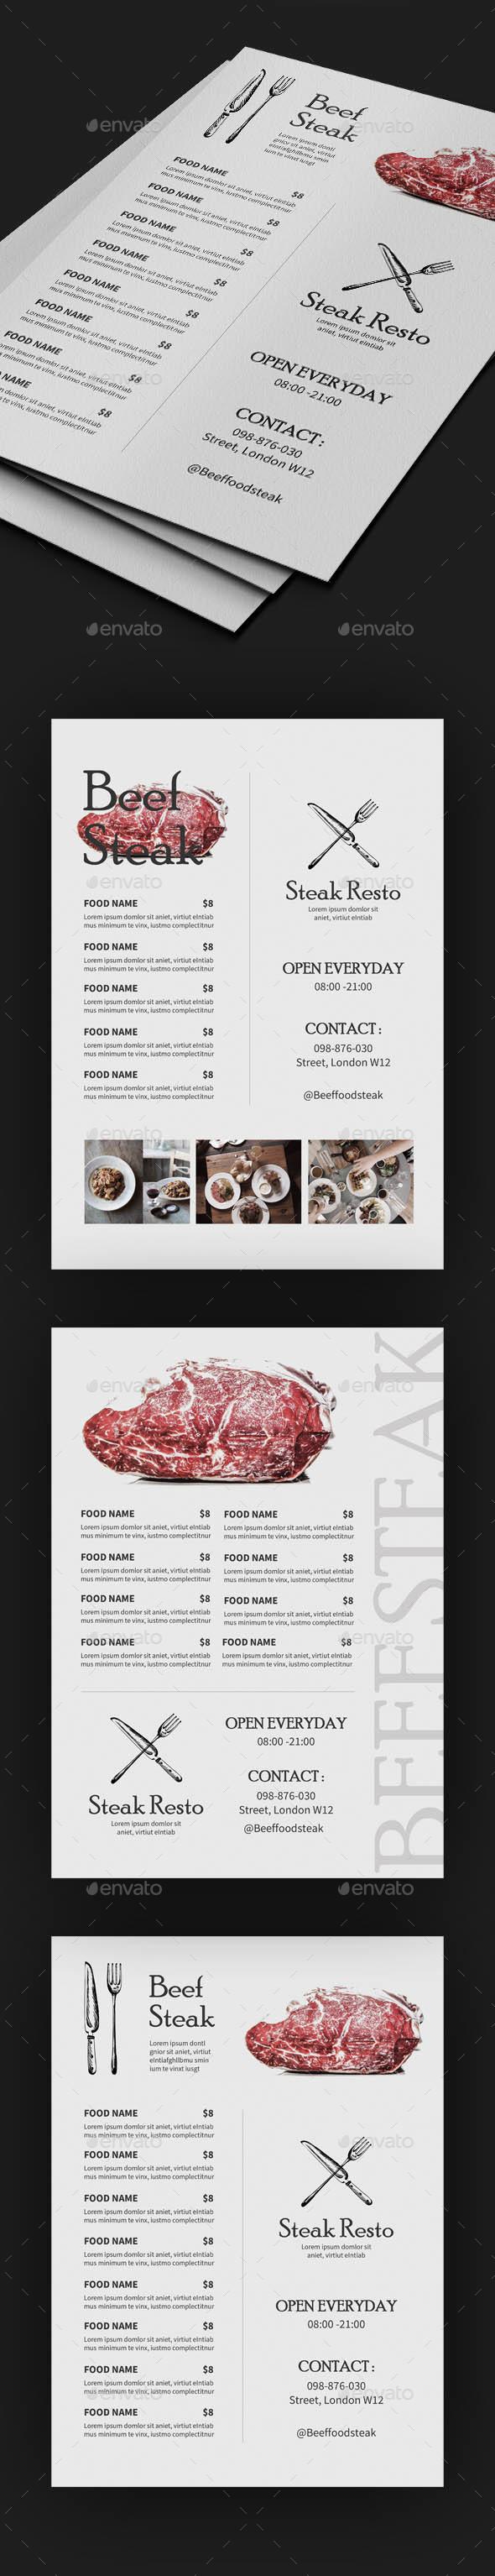 GraphicRiver Vintage Food Menus 20317083